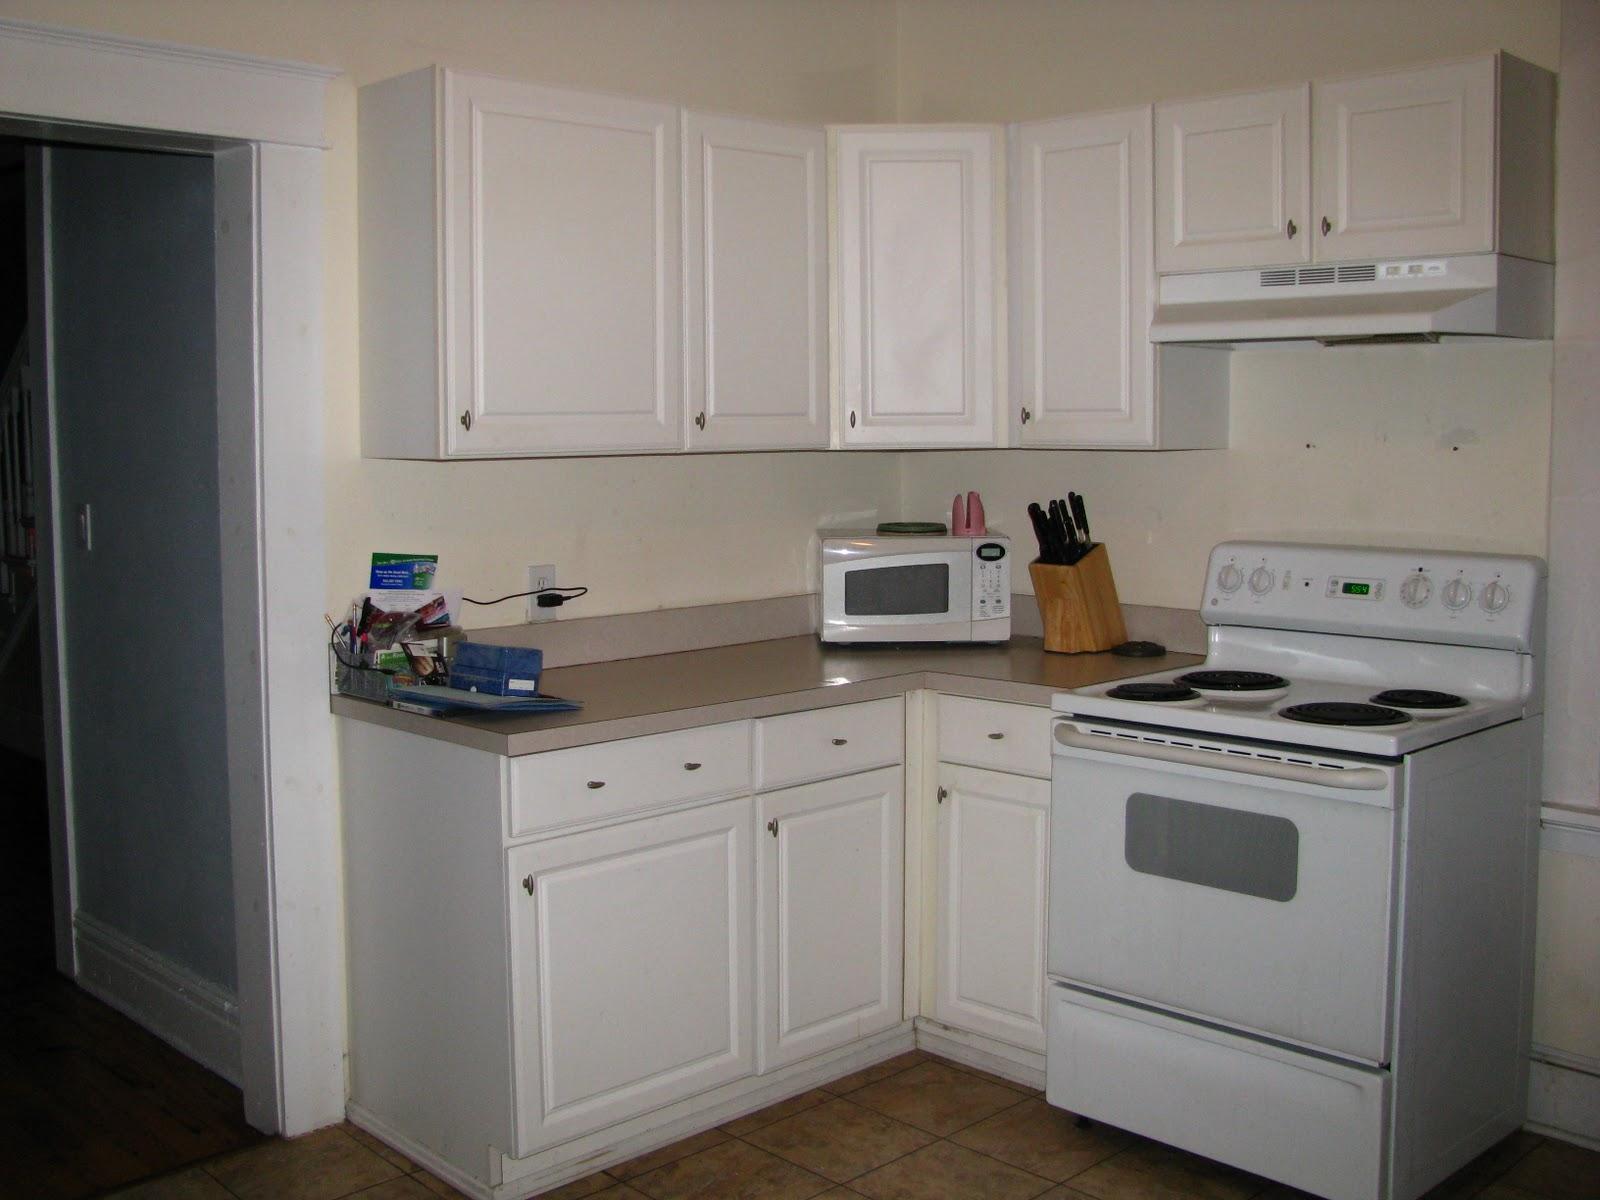 Remodel Kitchen Cheap Preschool Set Remodelaholic On The